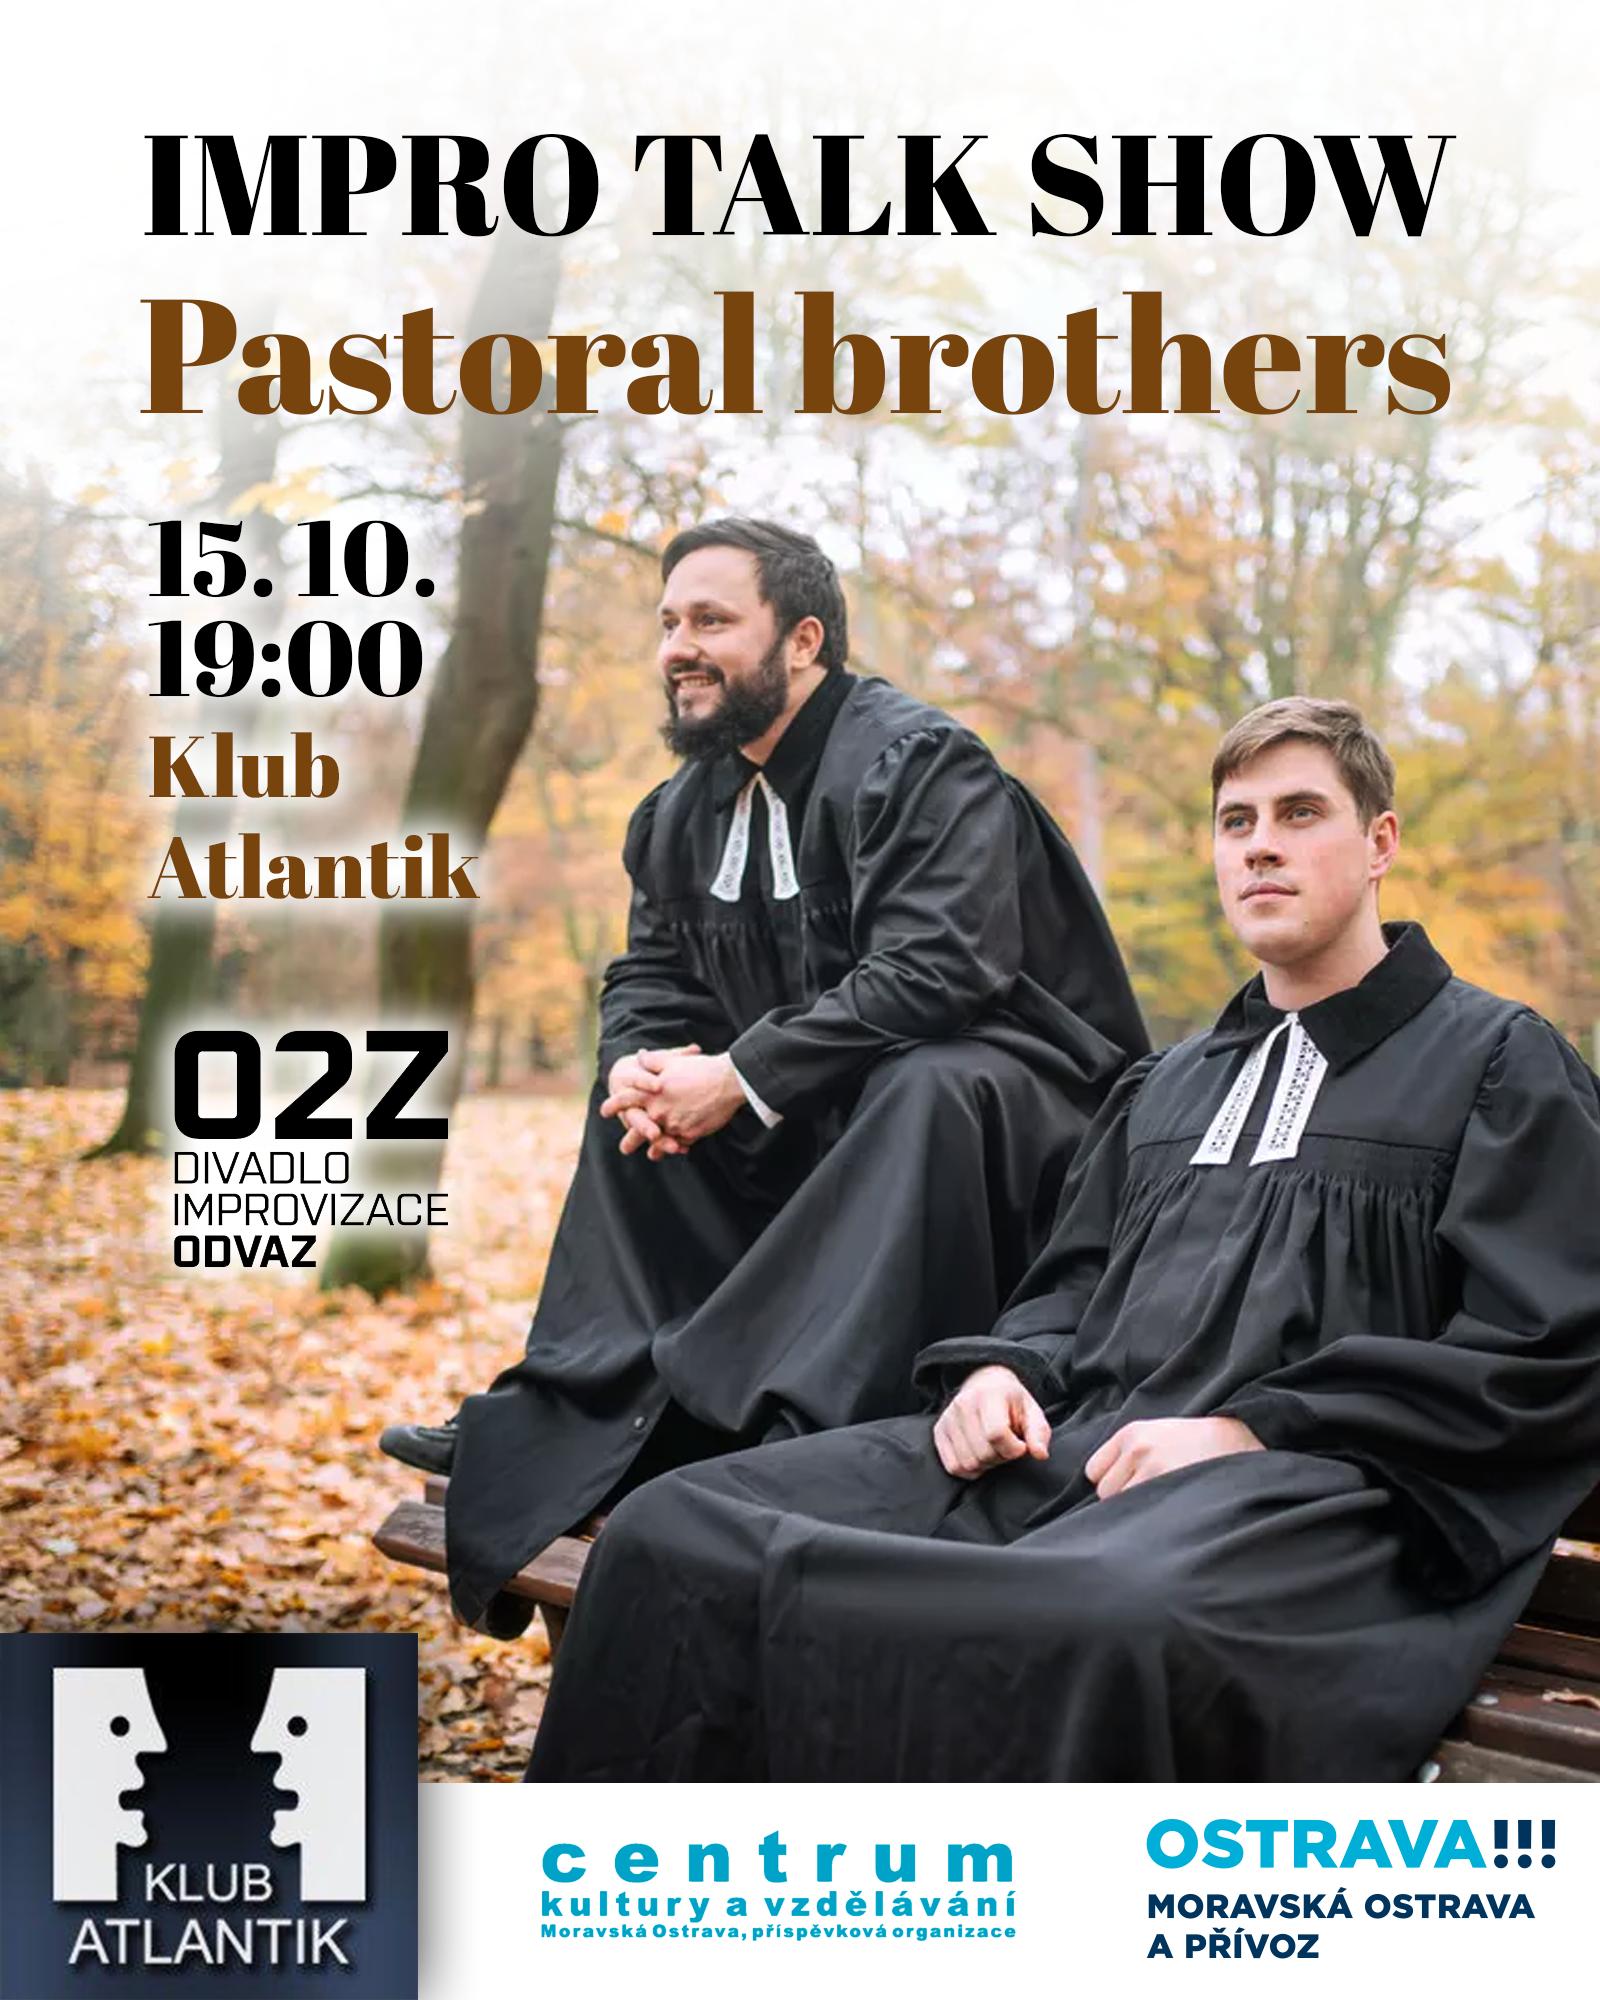 Impro talk show: Pastoral brothers